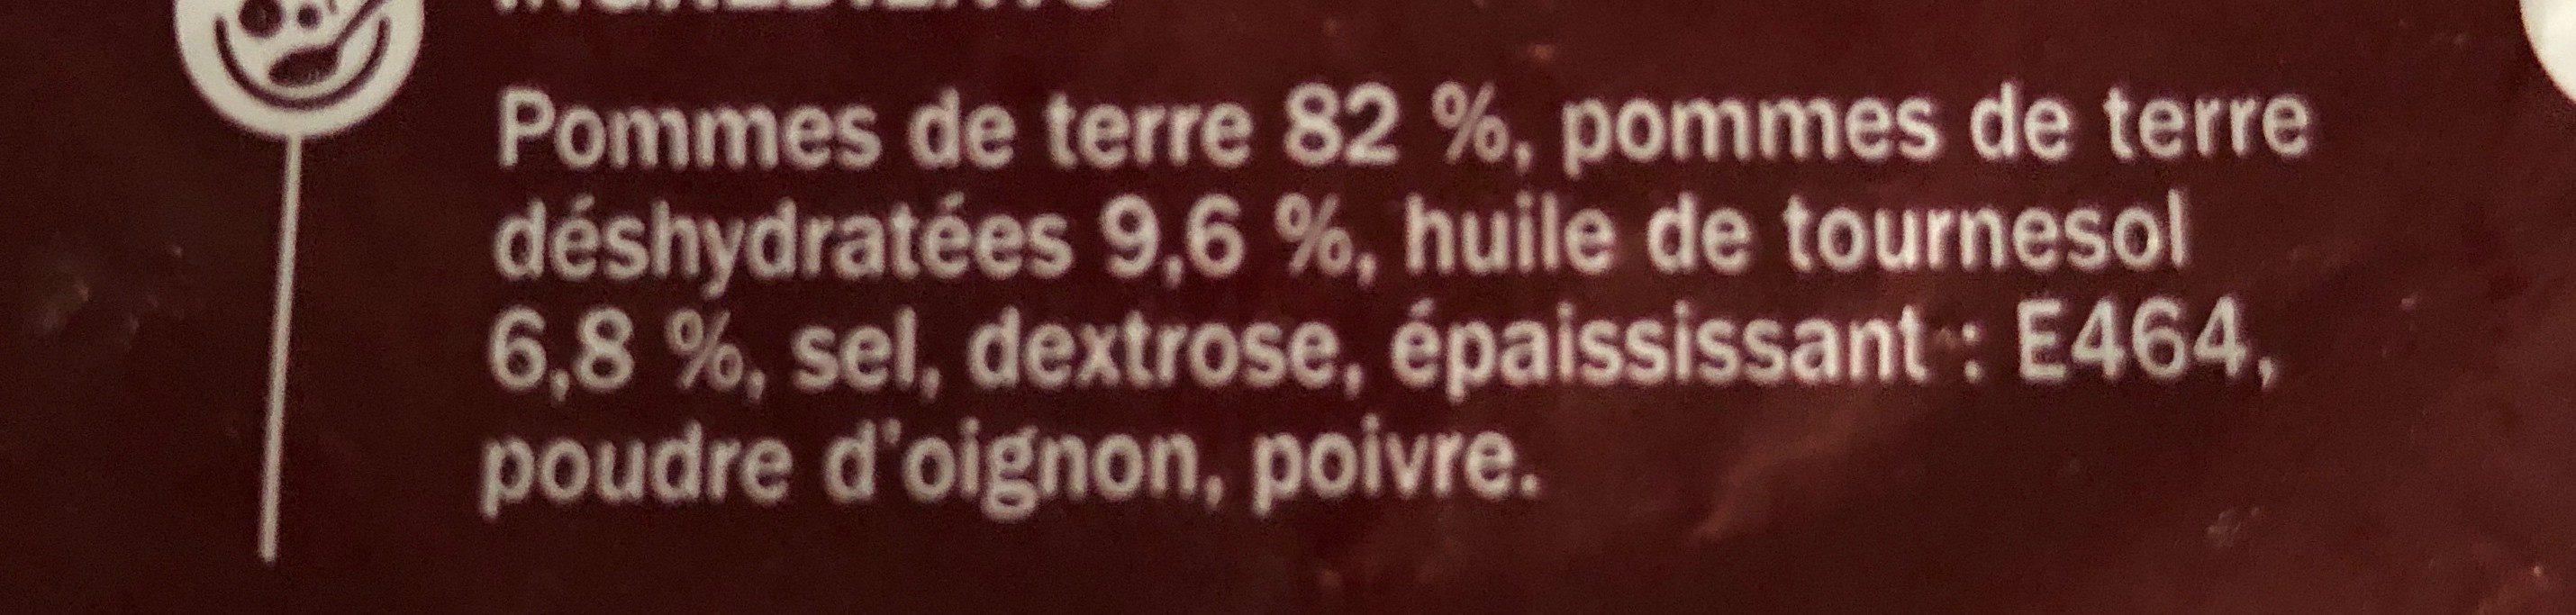 Pommes de terre noisettes - Ingredienti - fr